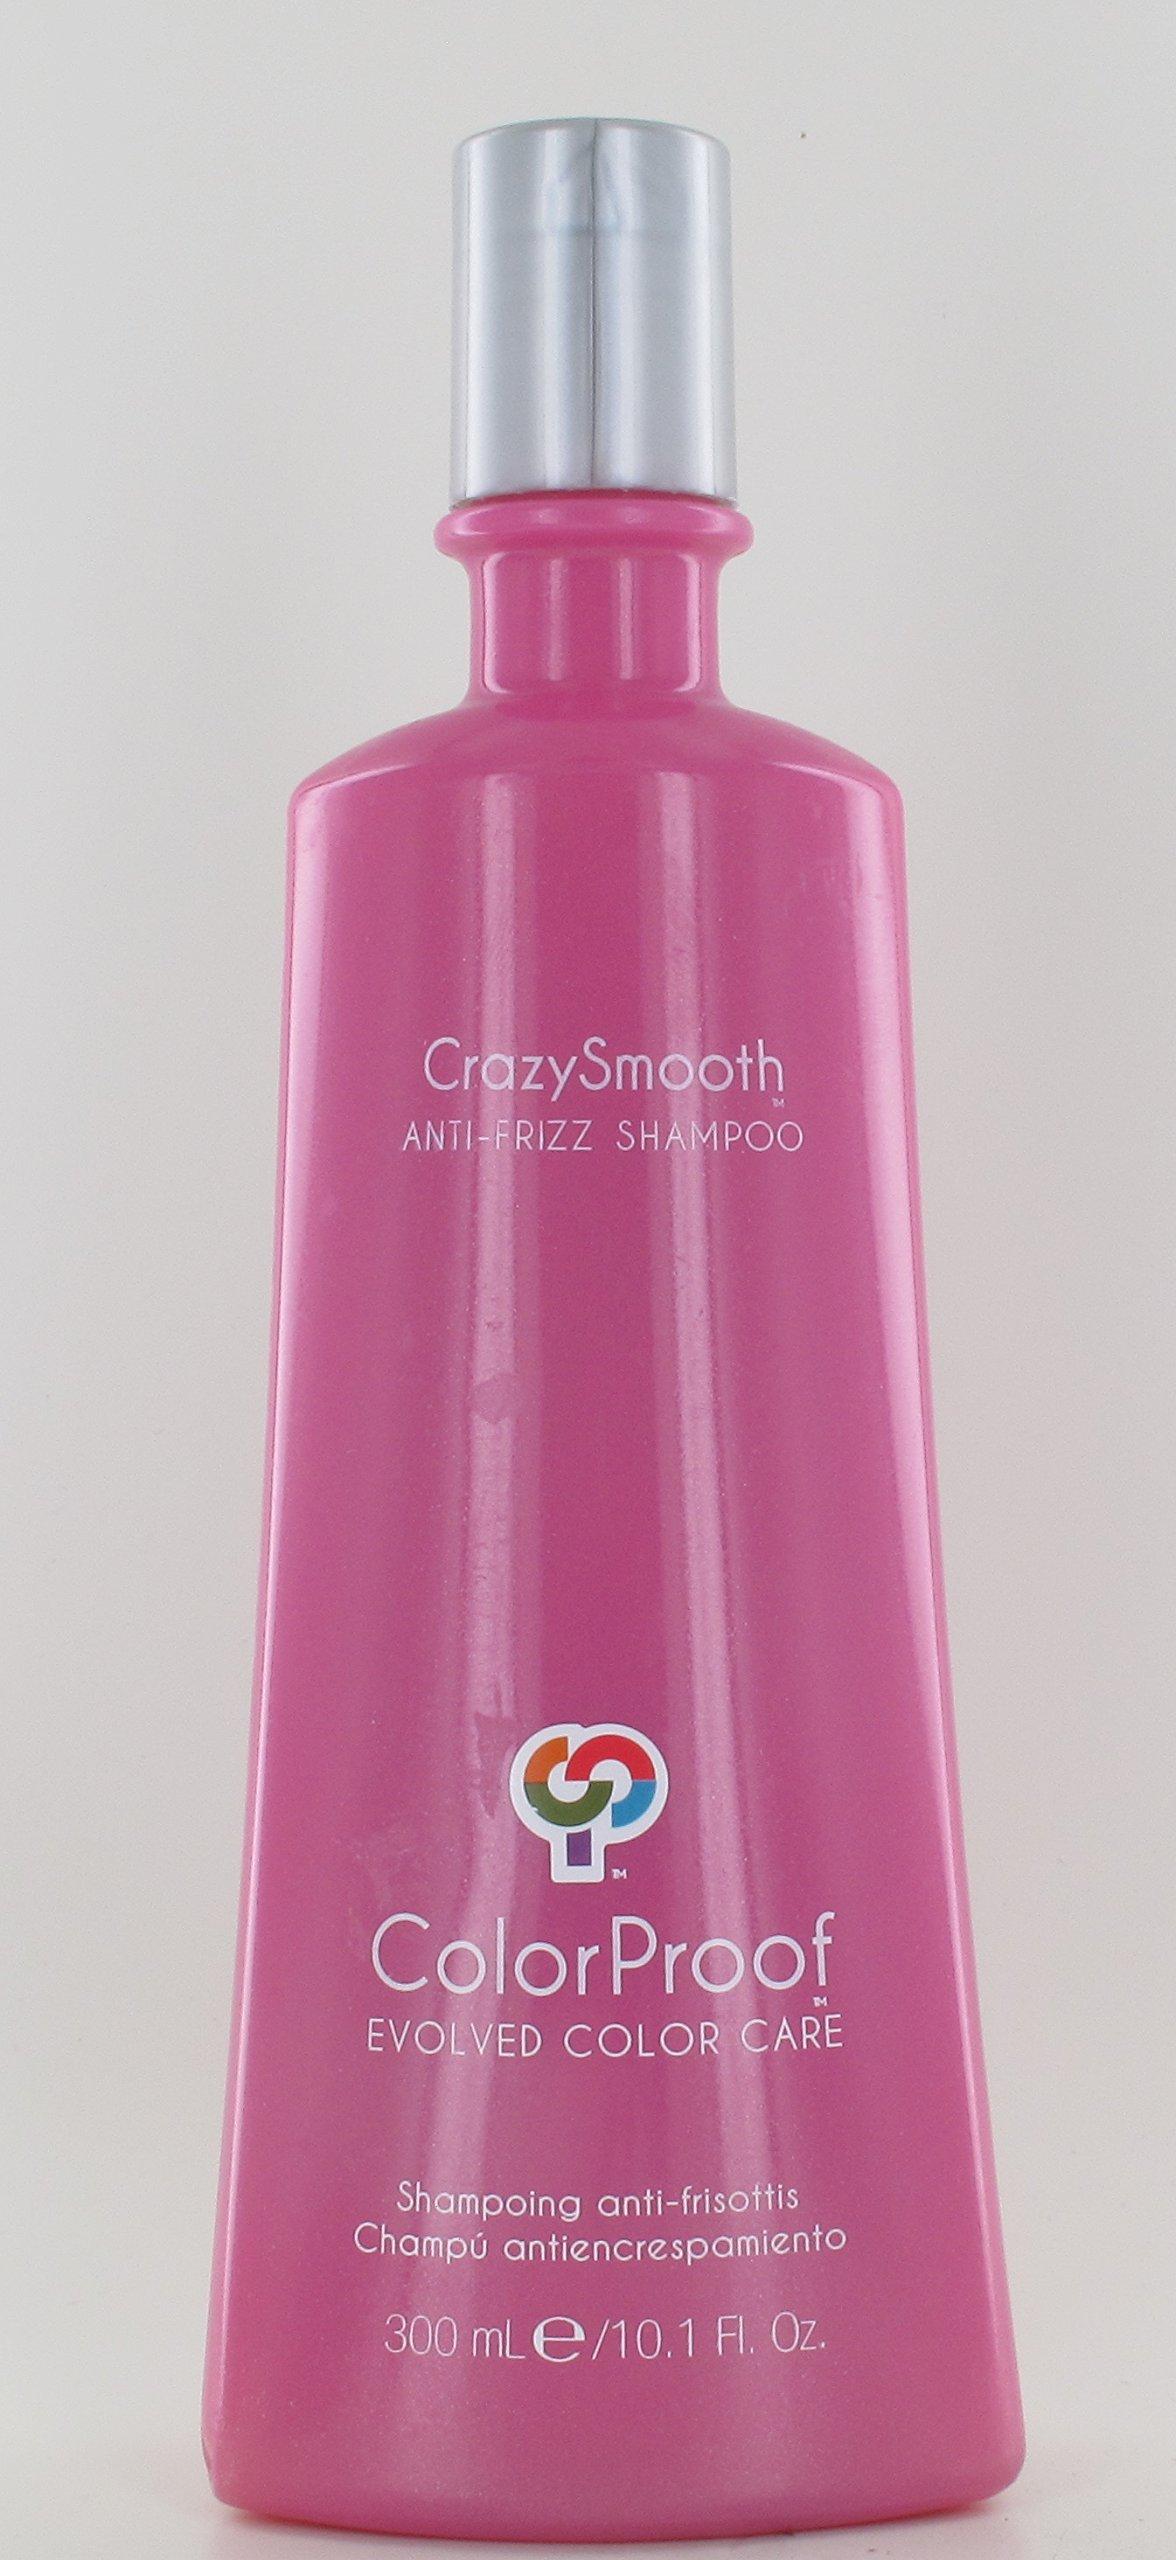 ColorProof CrazySmooth Anti-Frizz Shampoo 10.1oz